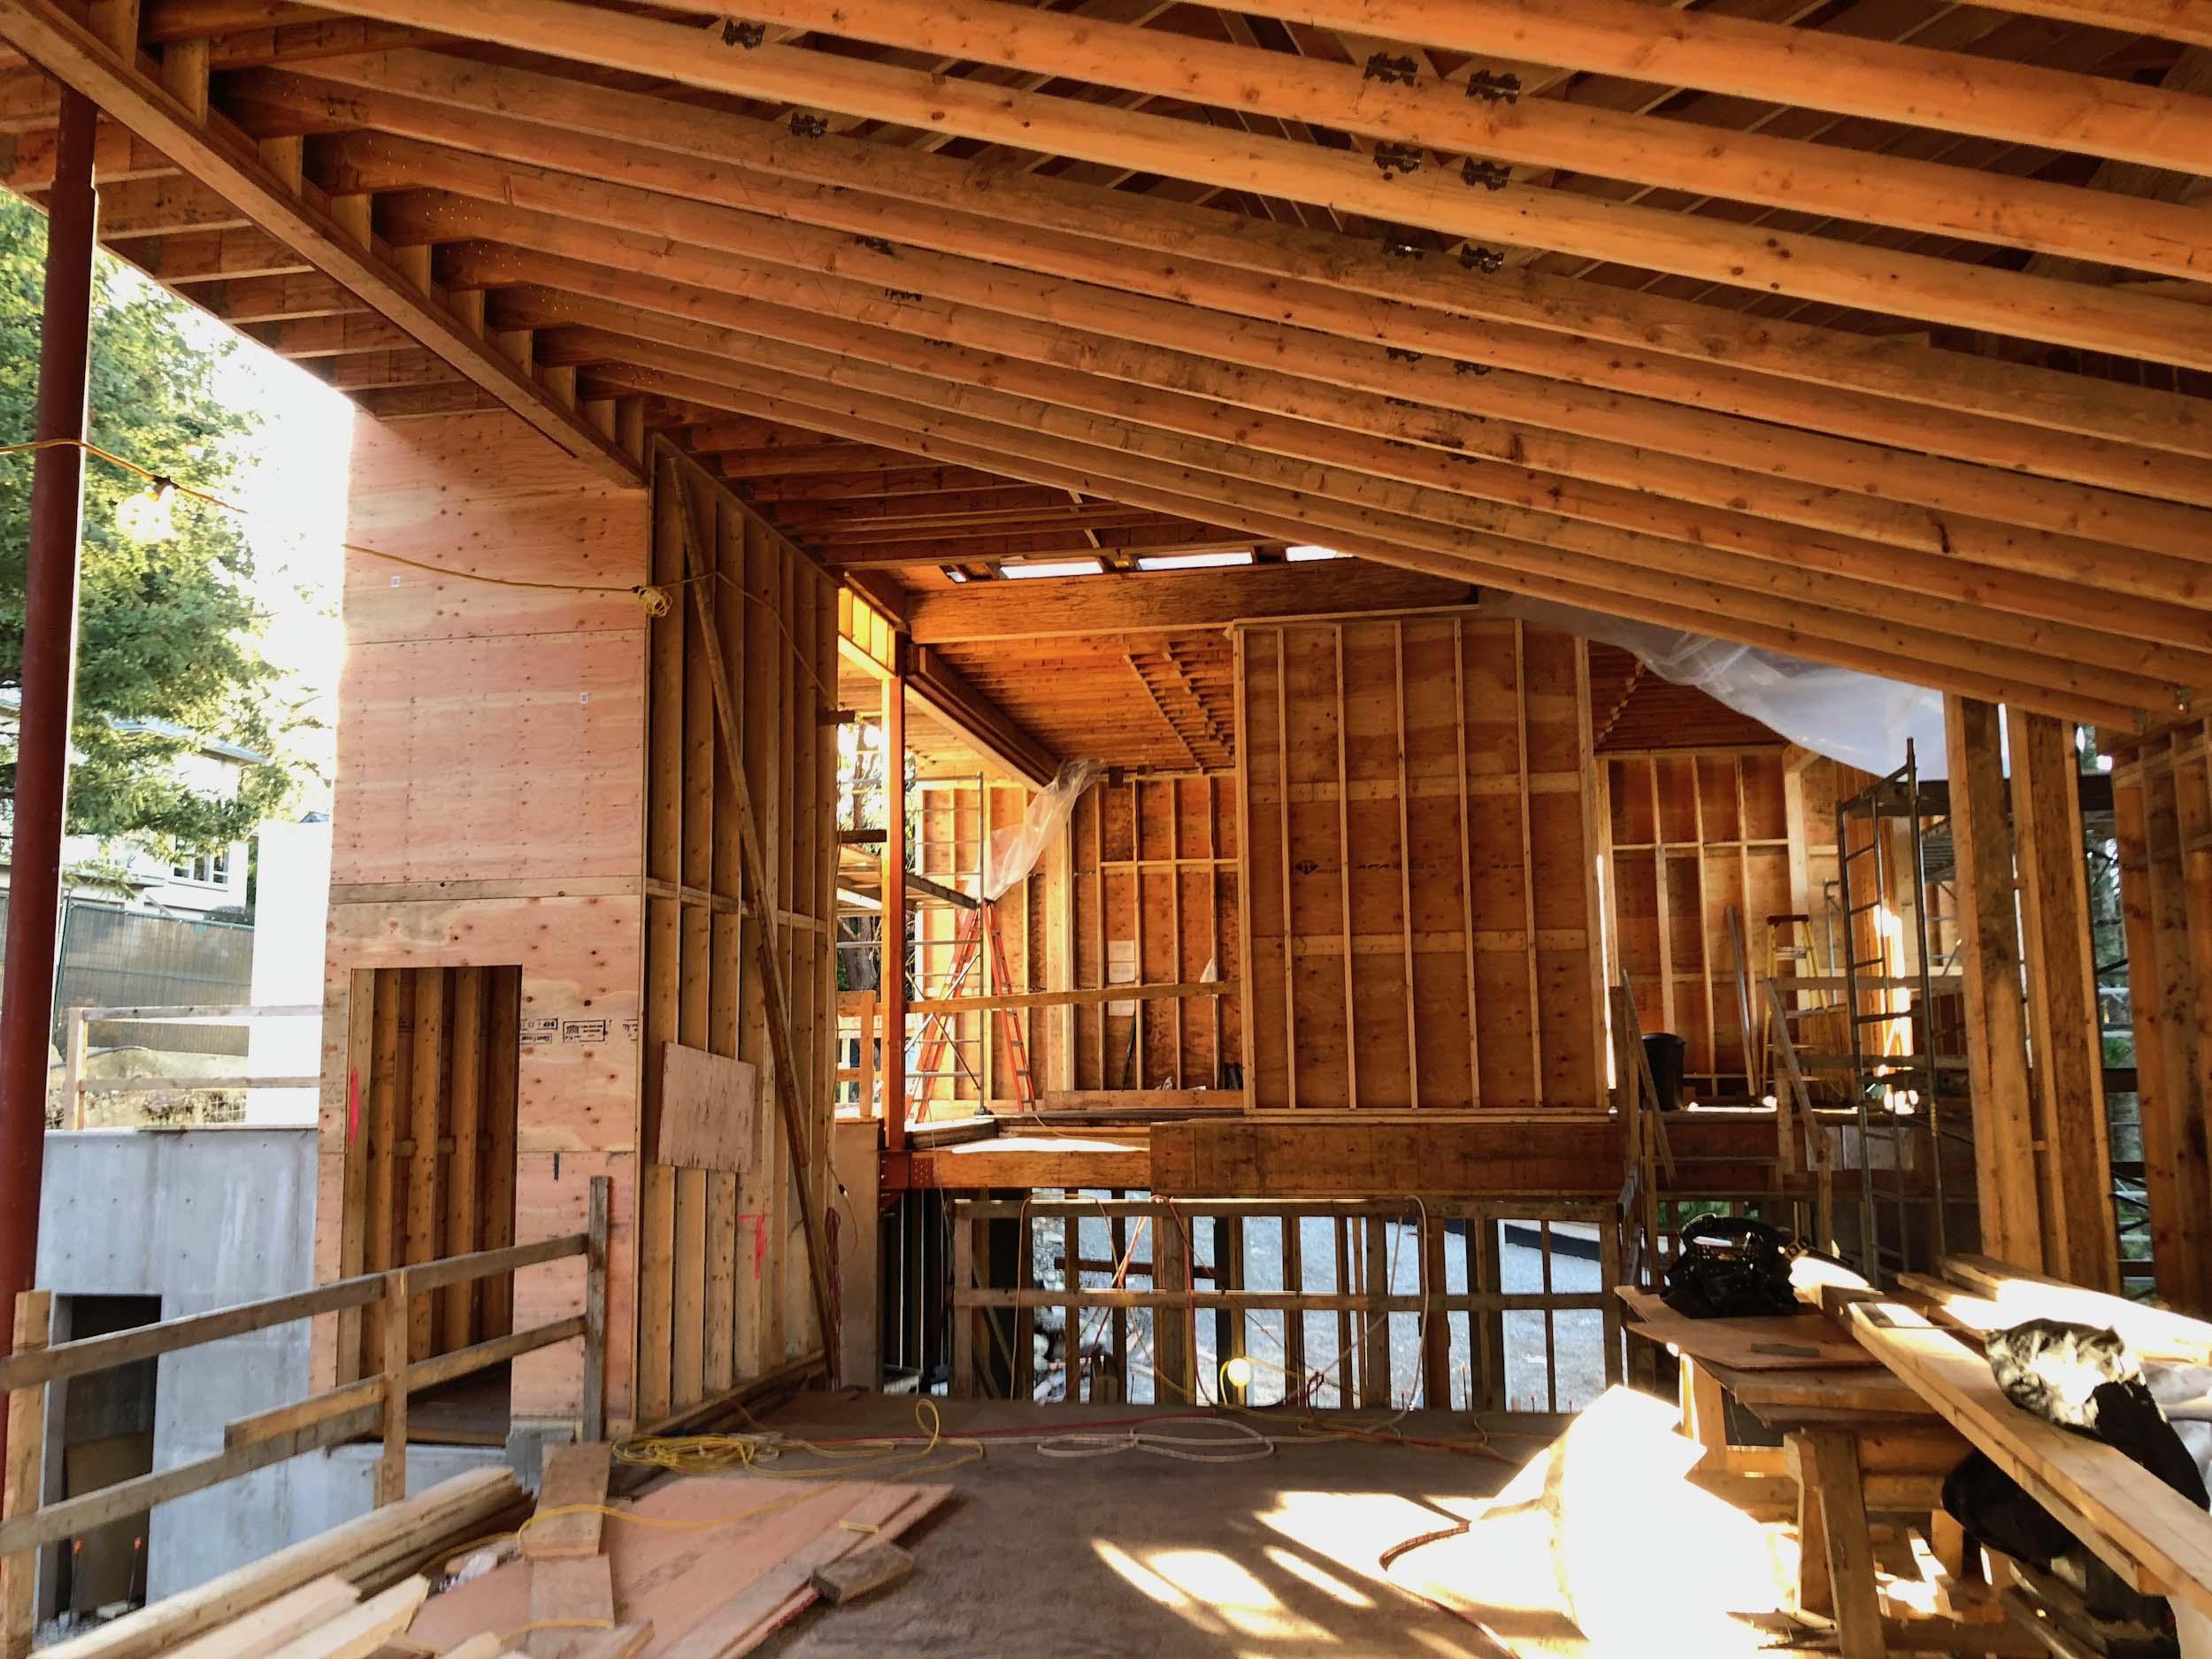 Postle_Construction_WoodFraming2.jpg